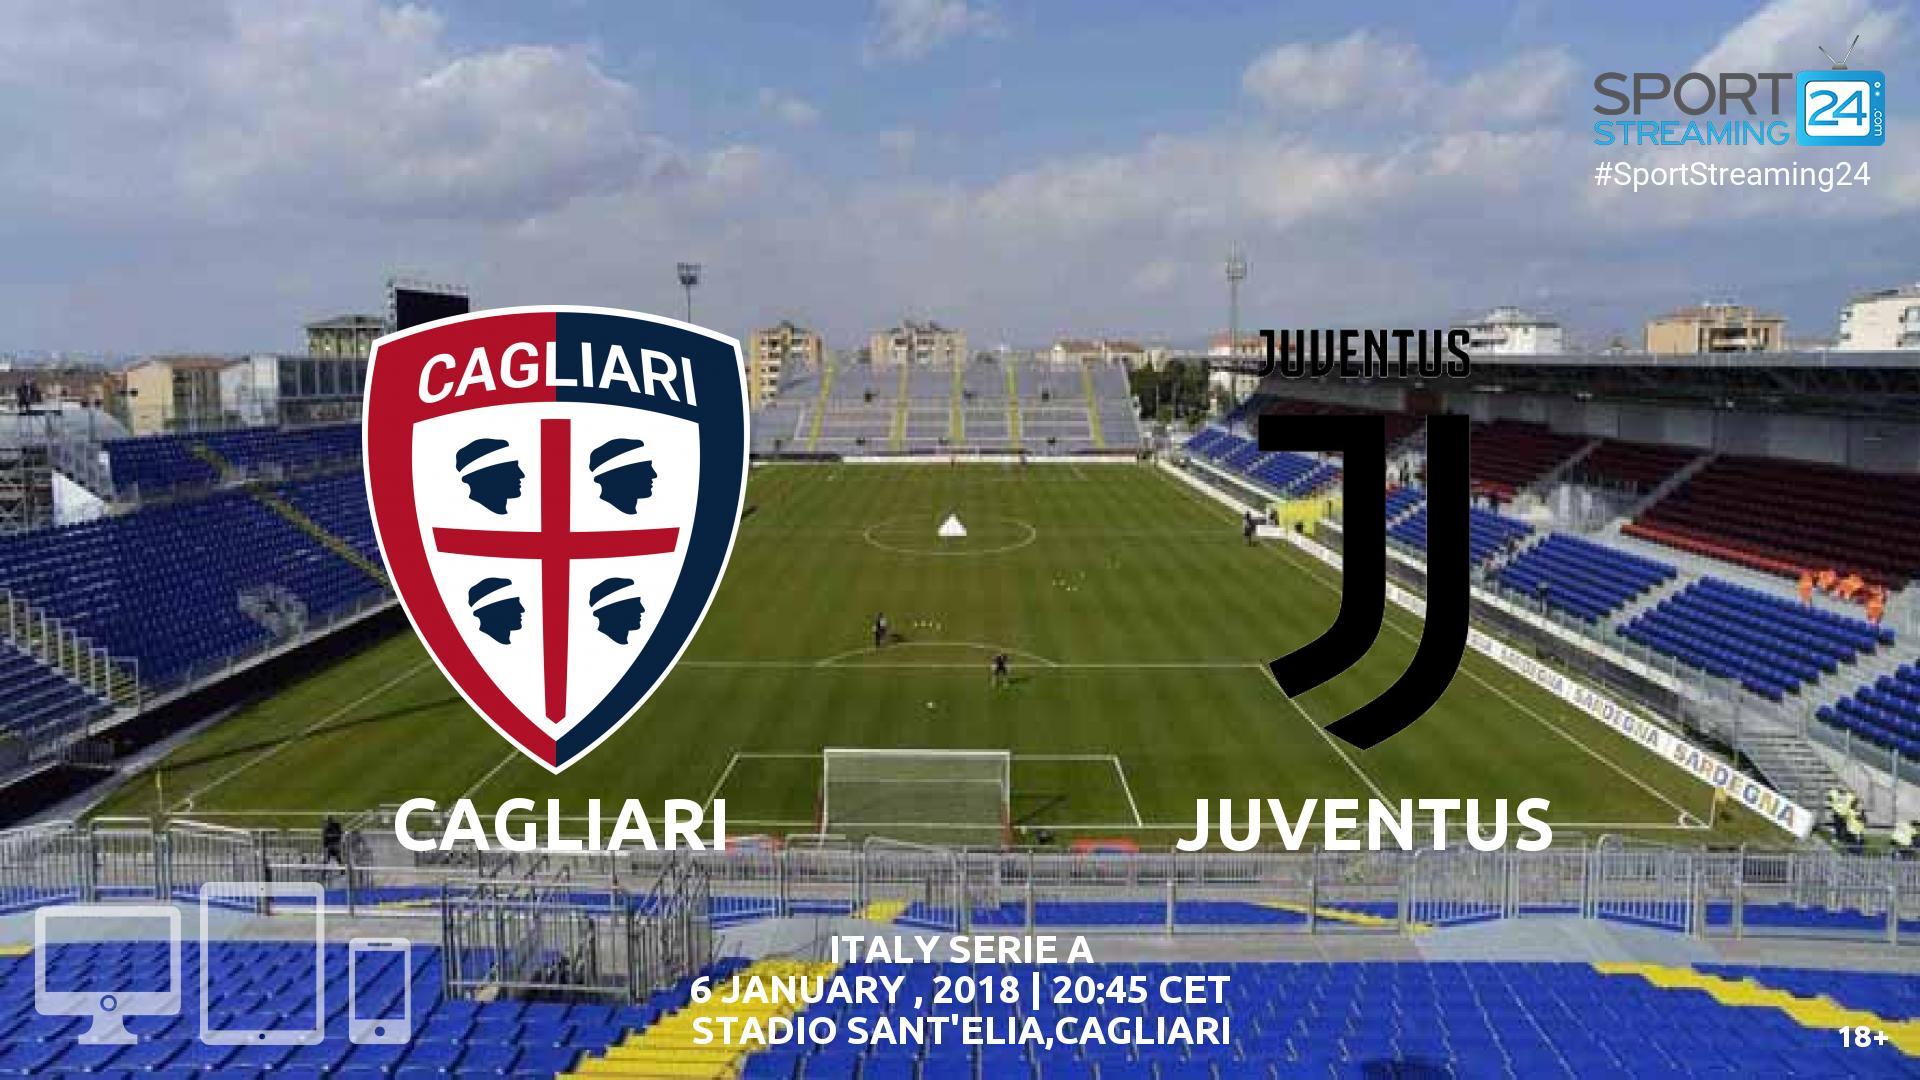 Cagliari v Juventus Live Stream | SportStreaming24